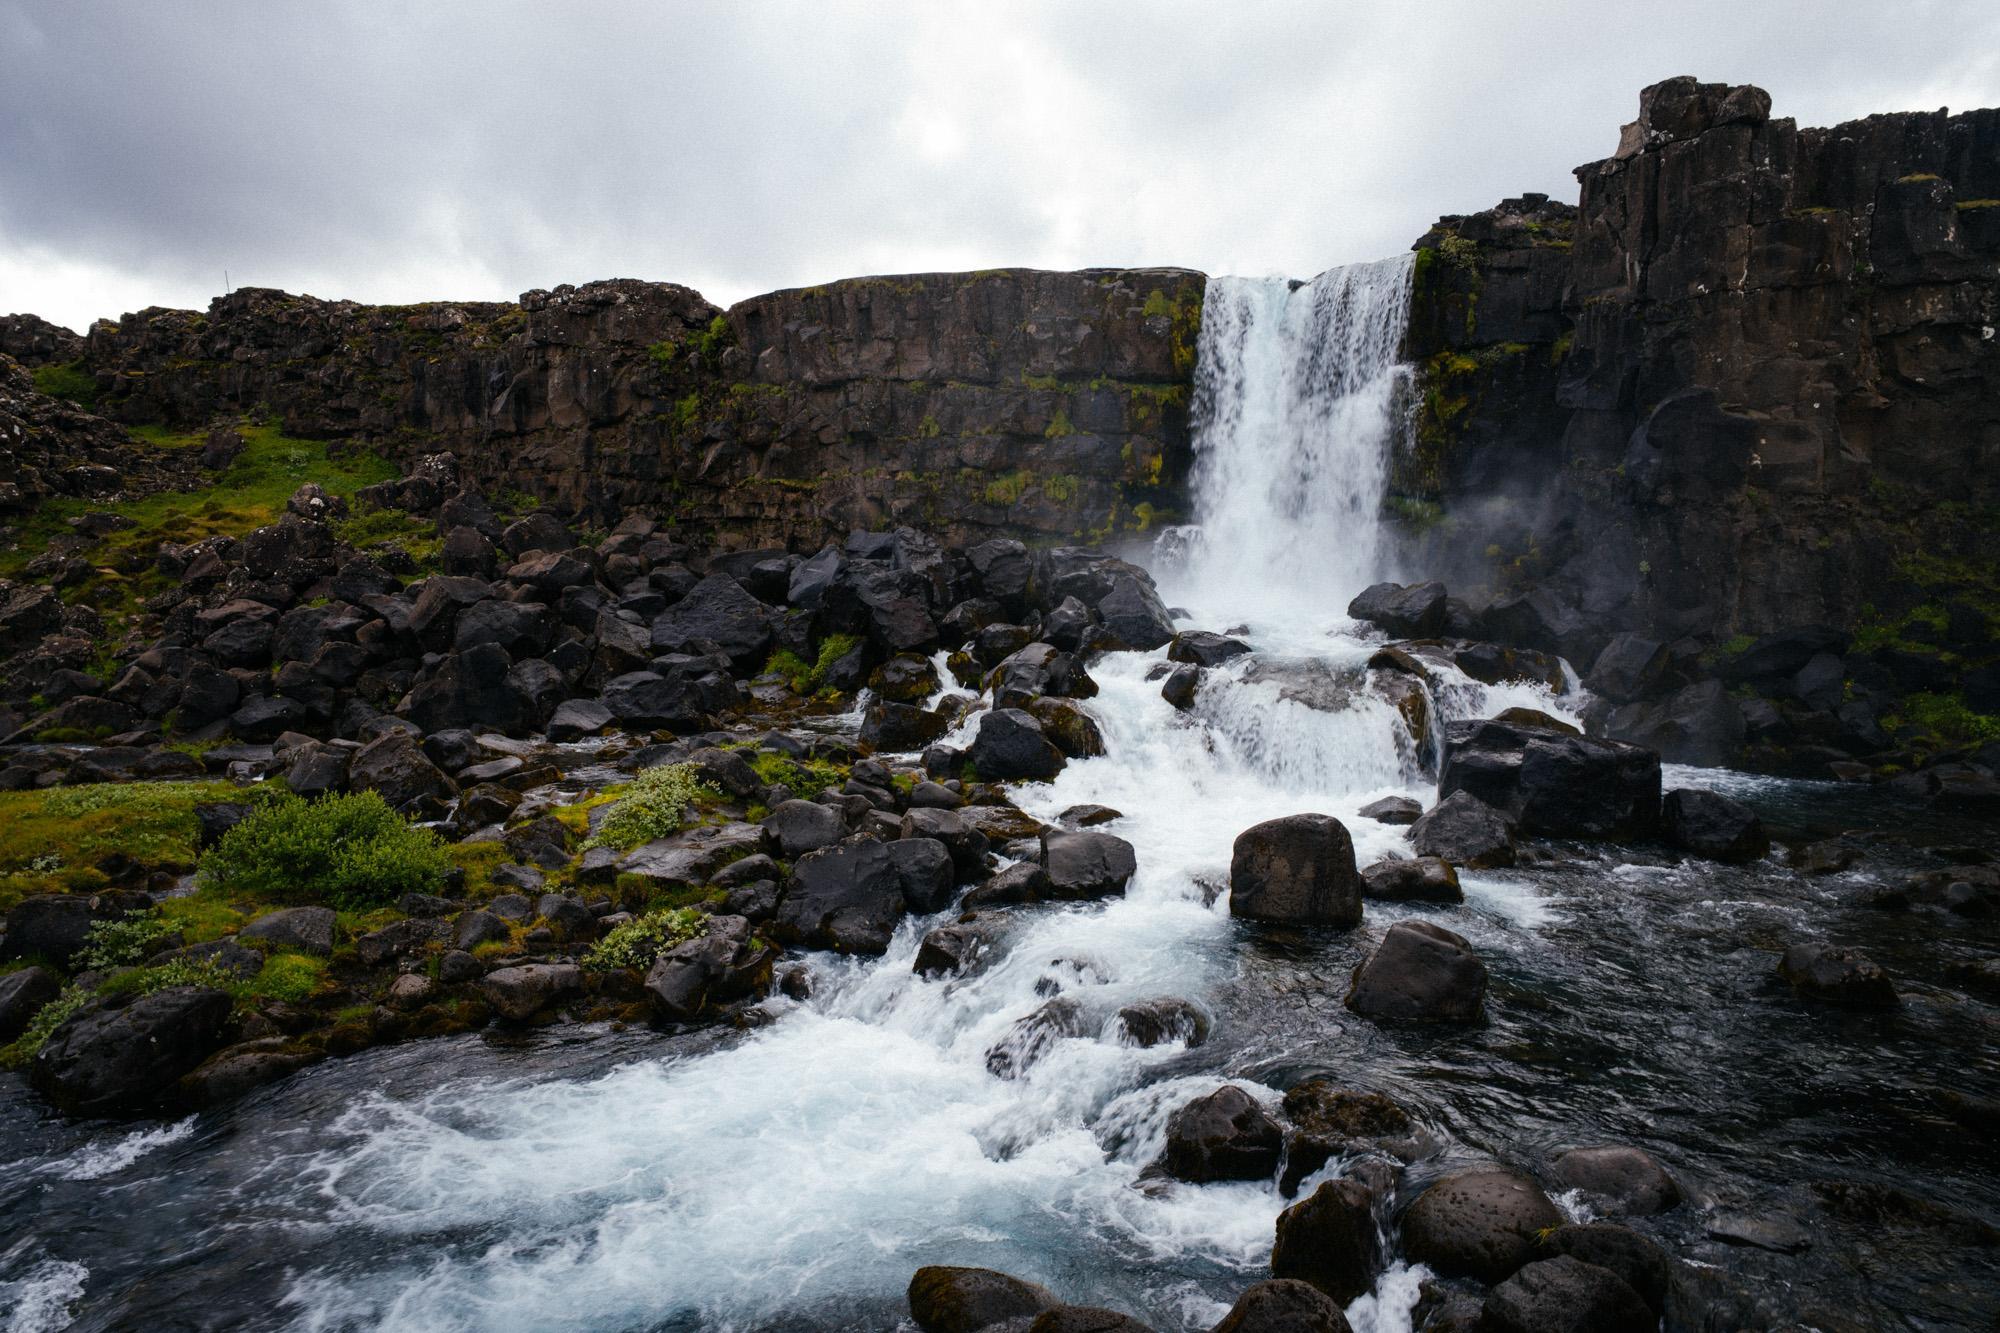 More waterfalls. Meh.